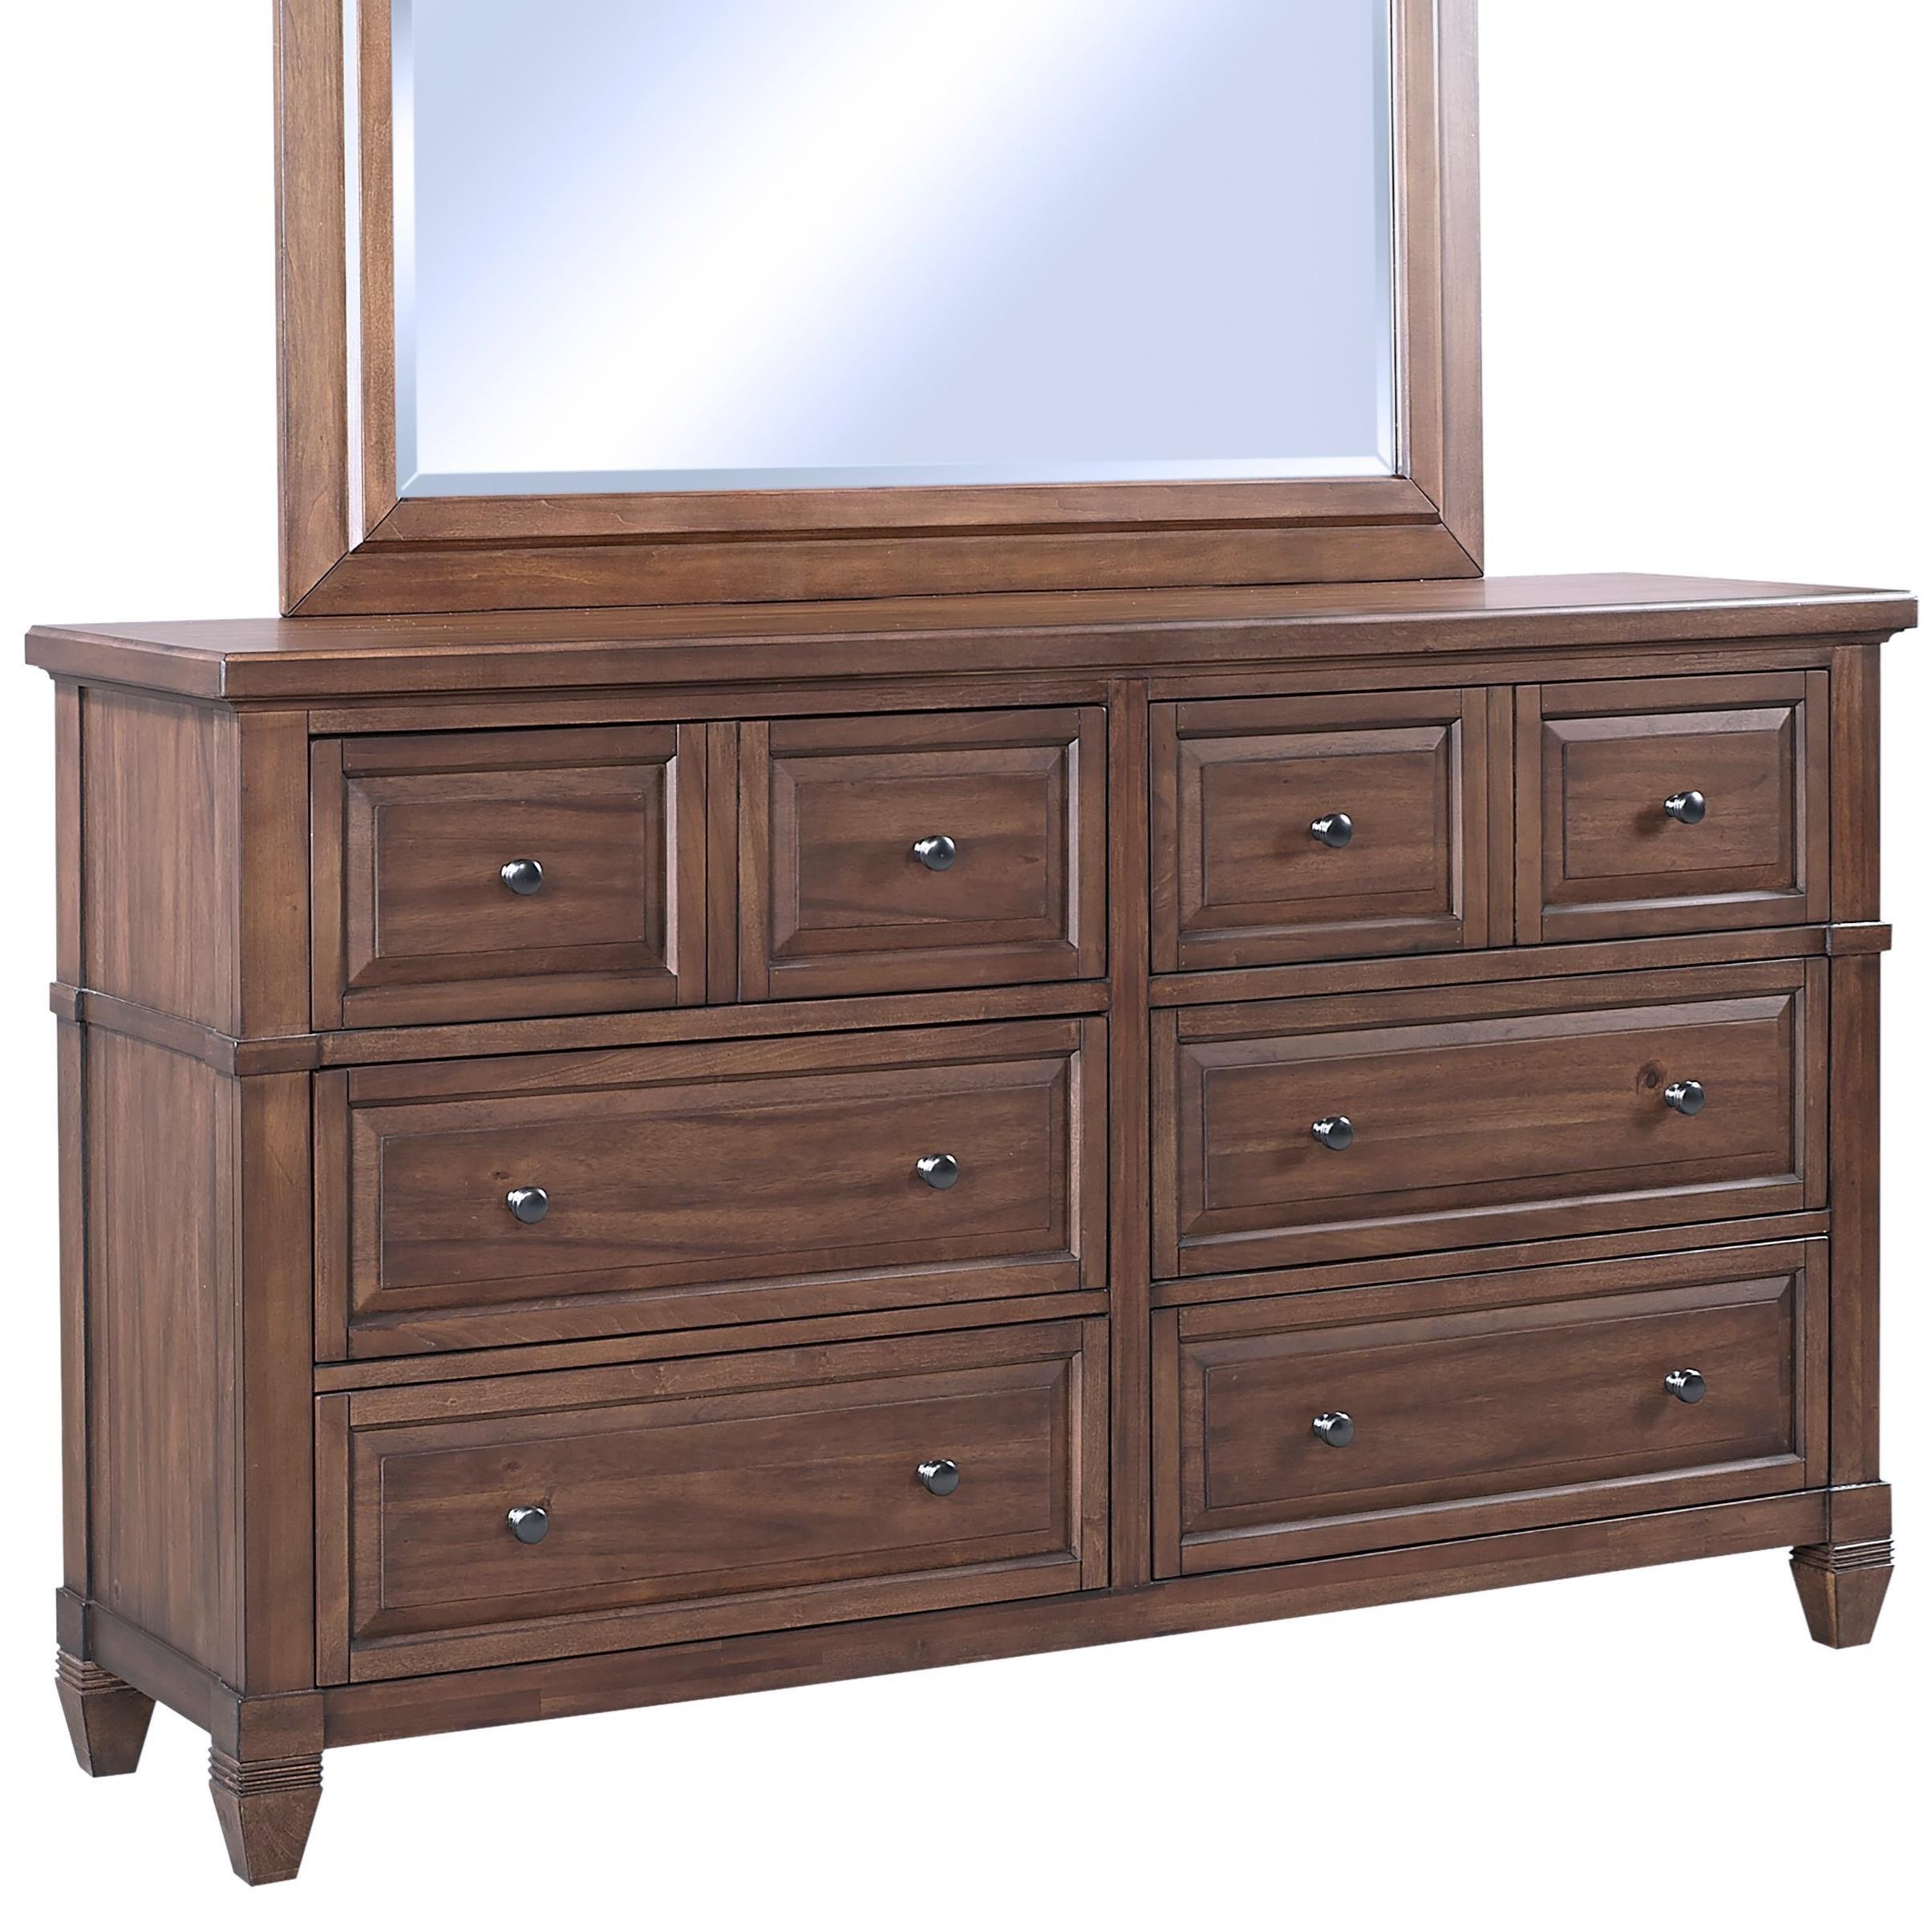 Delicieux Walkeru0027s Furniture